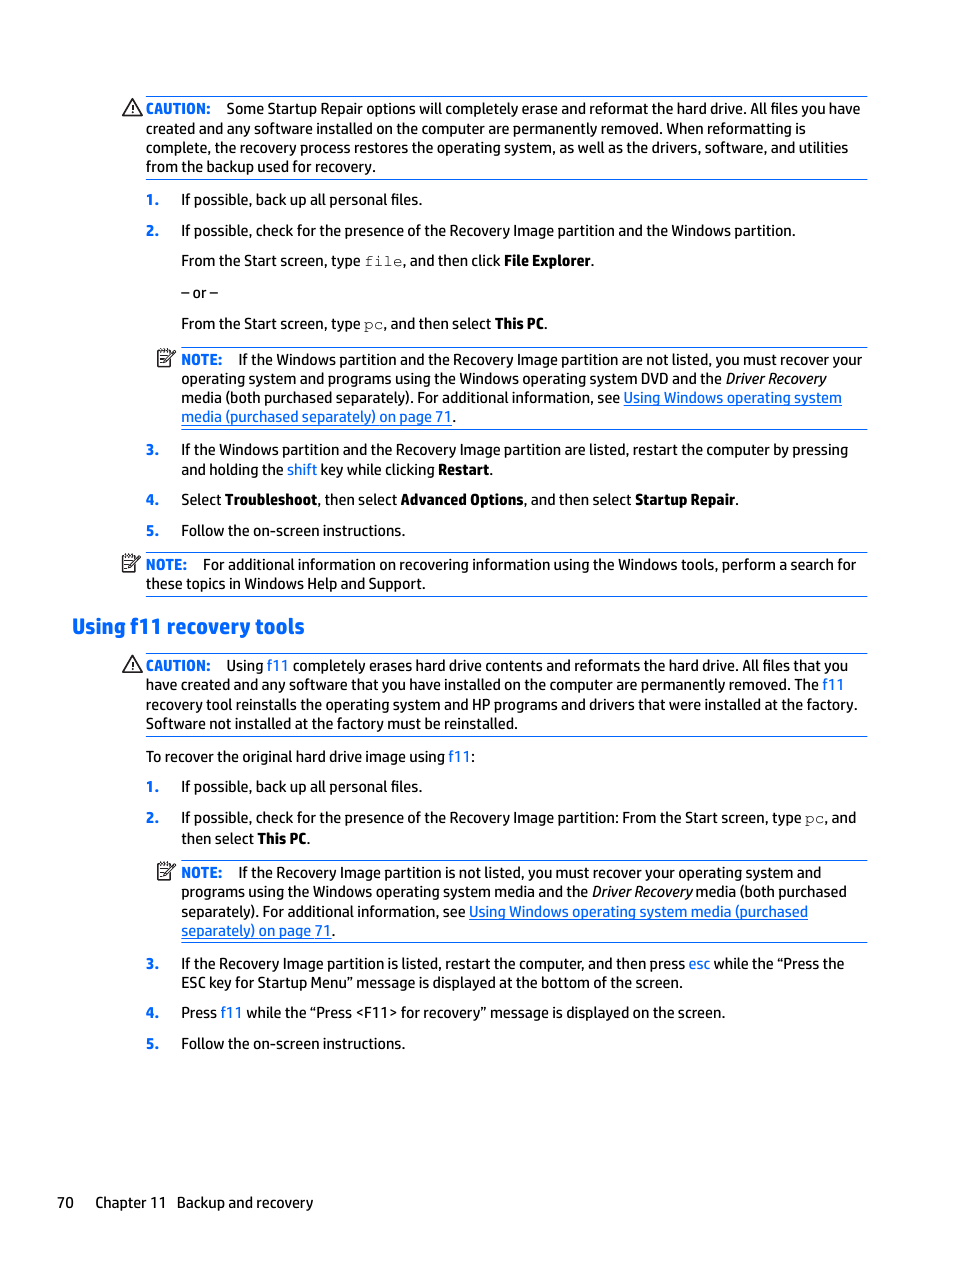 Using f11 recovery tools | HP EliteBook 840 G3 User Manual